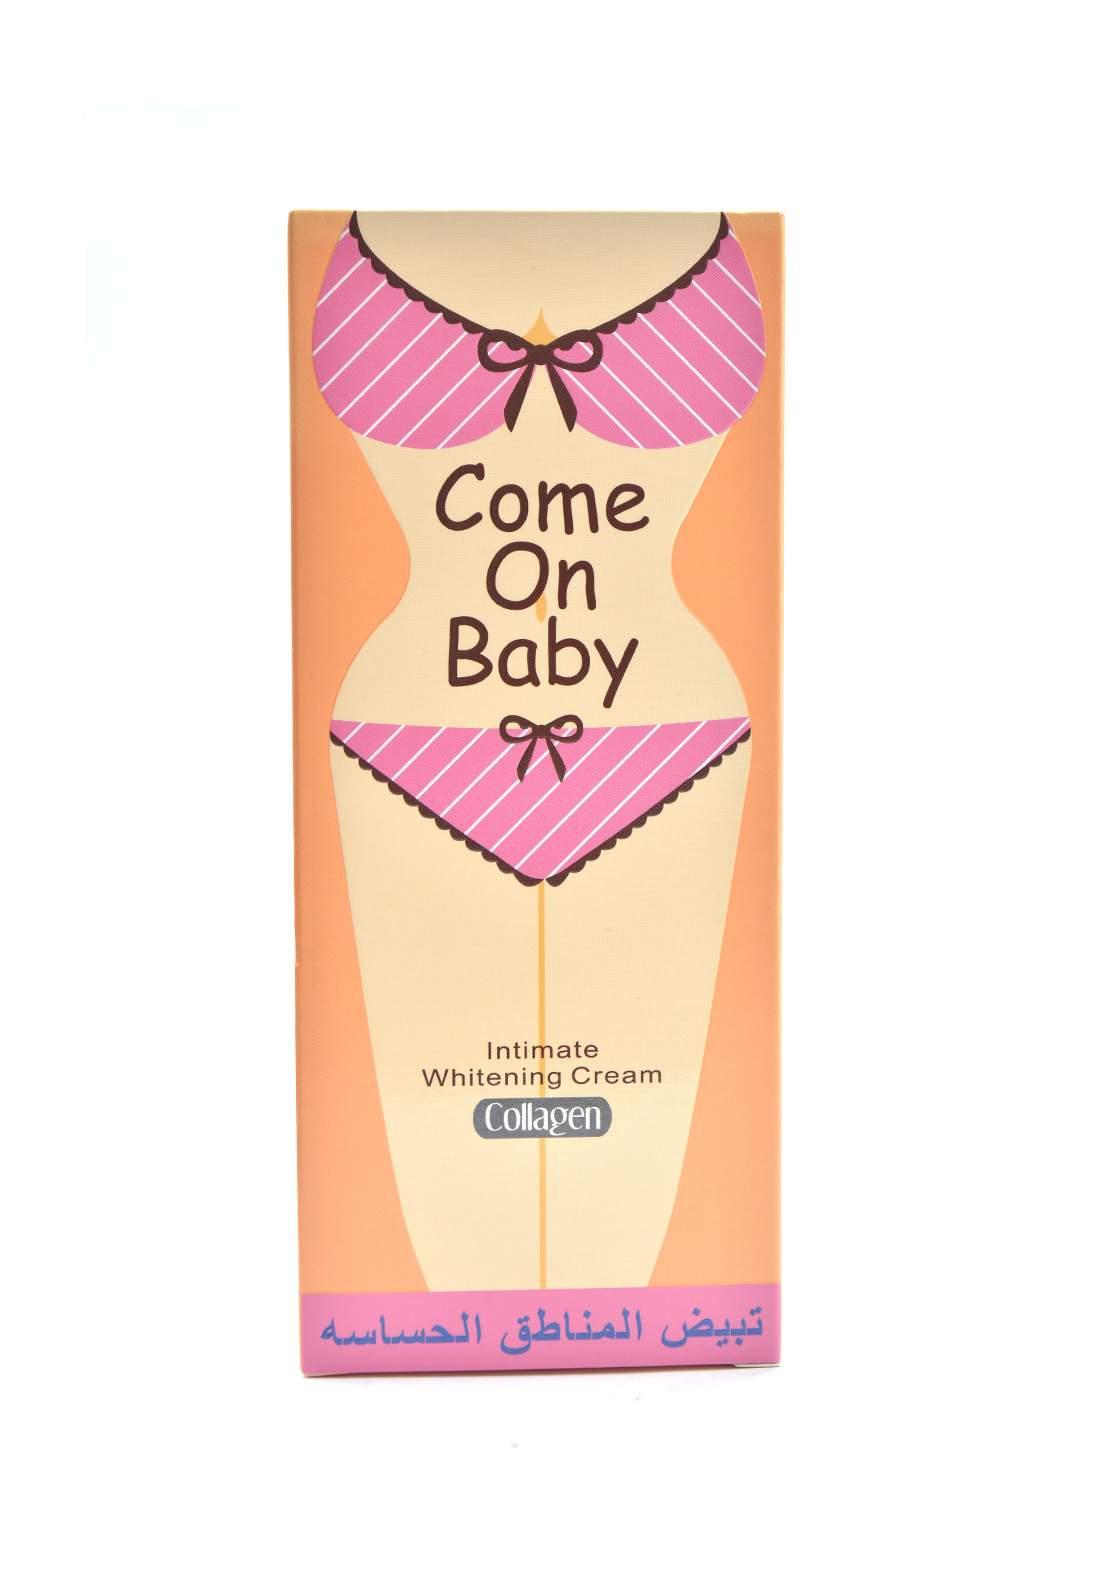 Come On Bady Intimate Whitening Cream 220ml مبيض مناطق حساسة